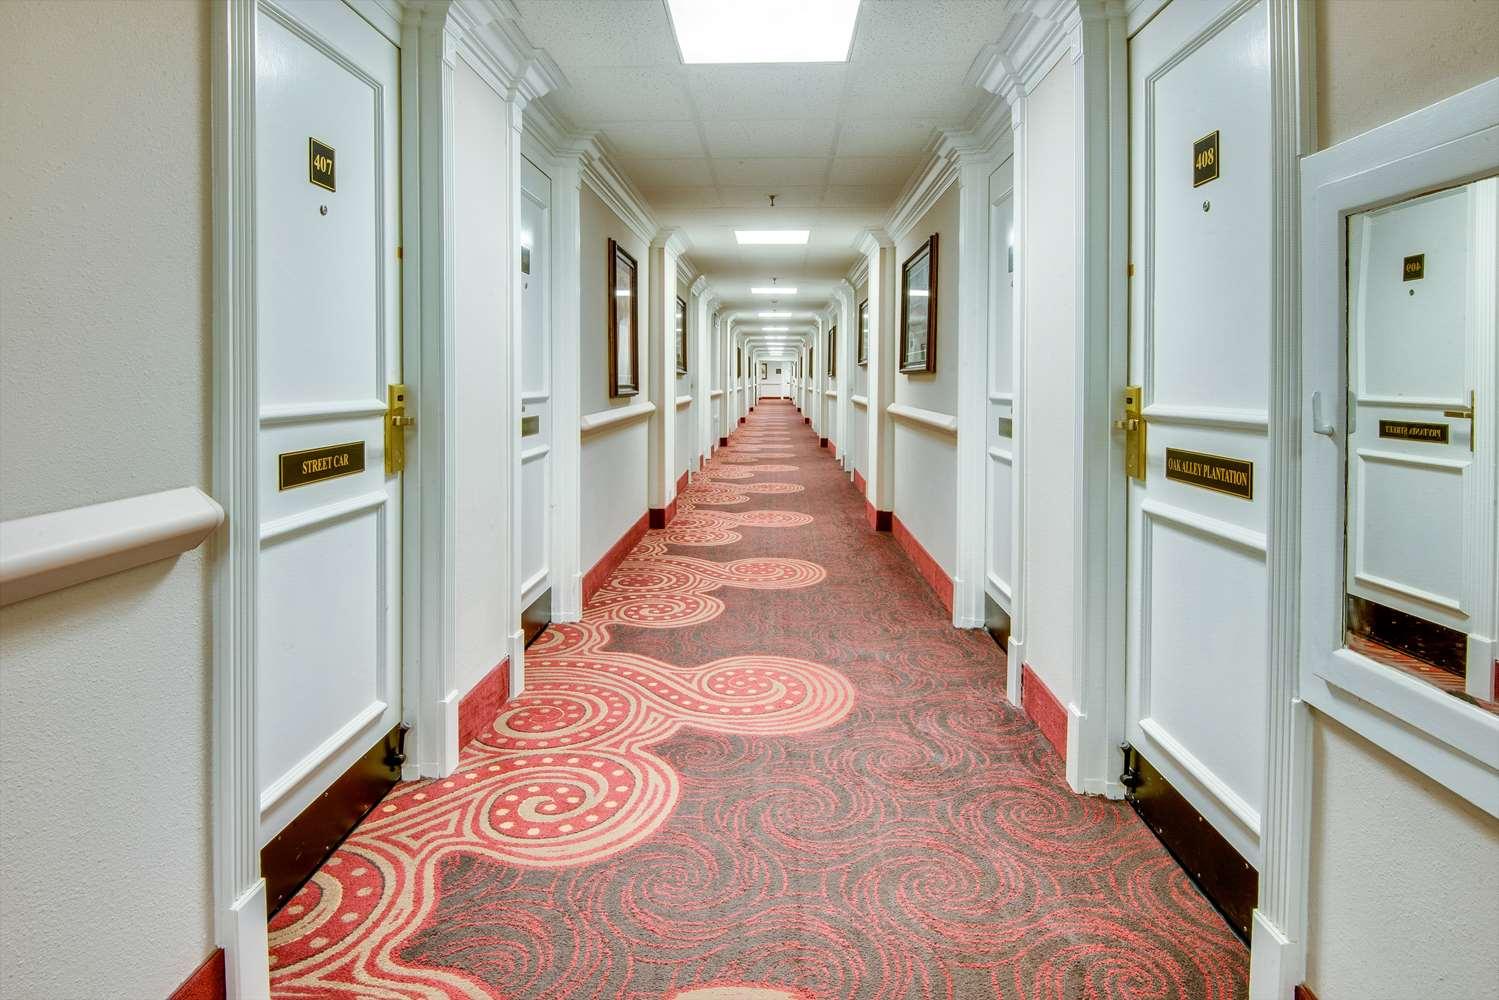 proam - Ramada Hotel Metairie